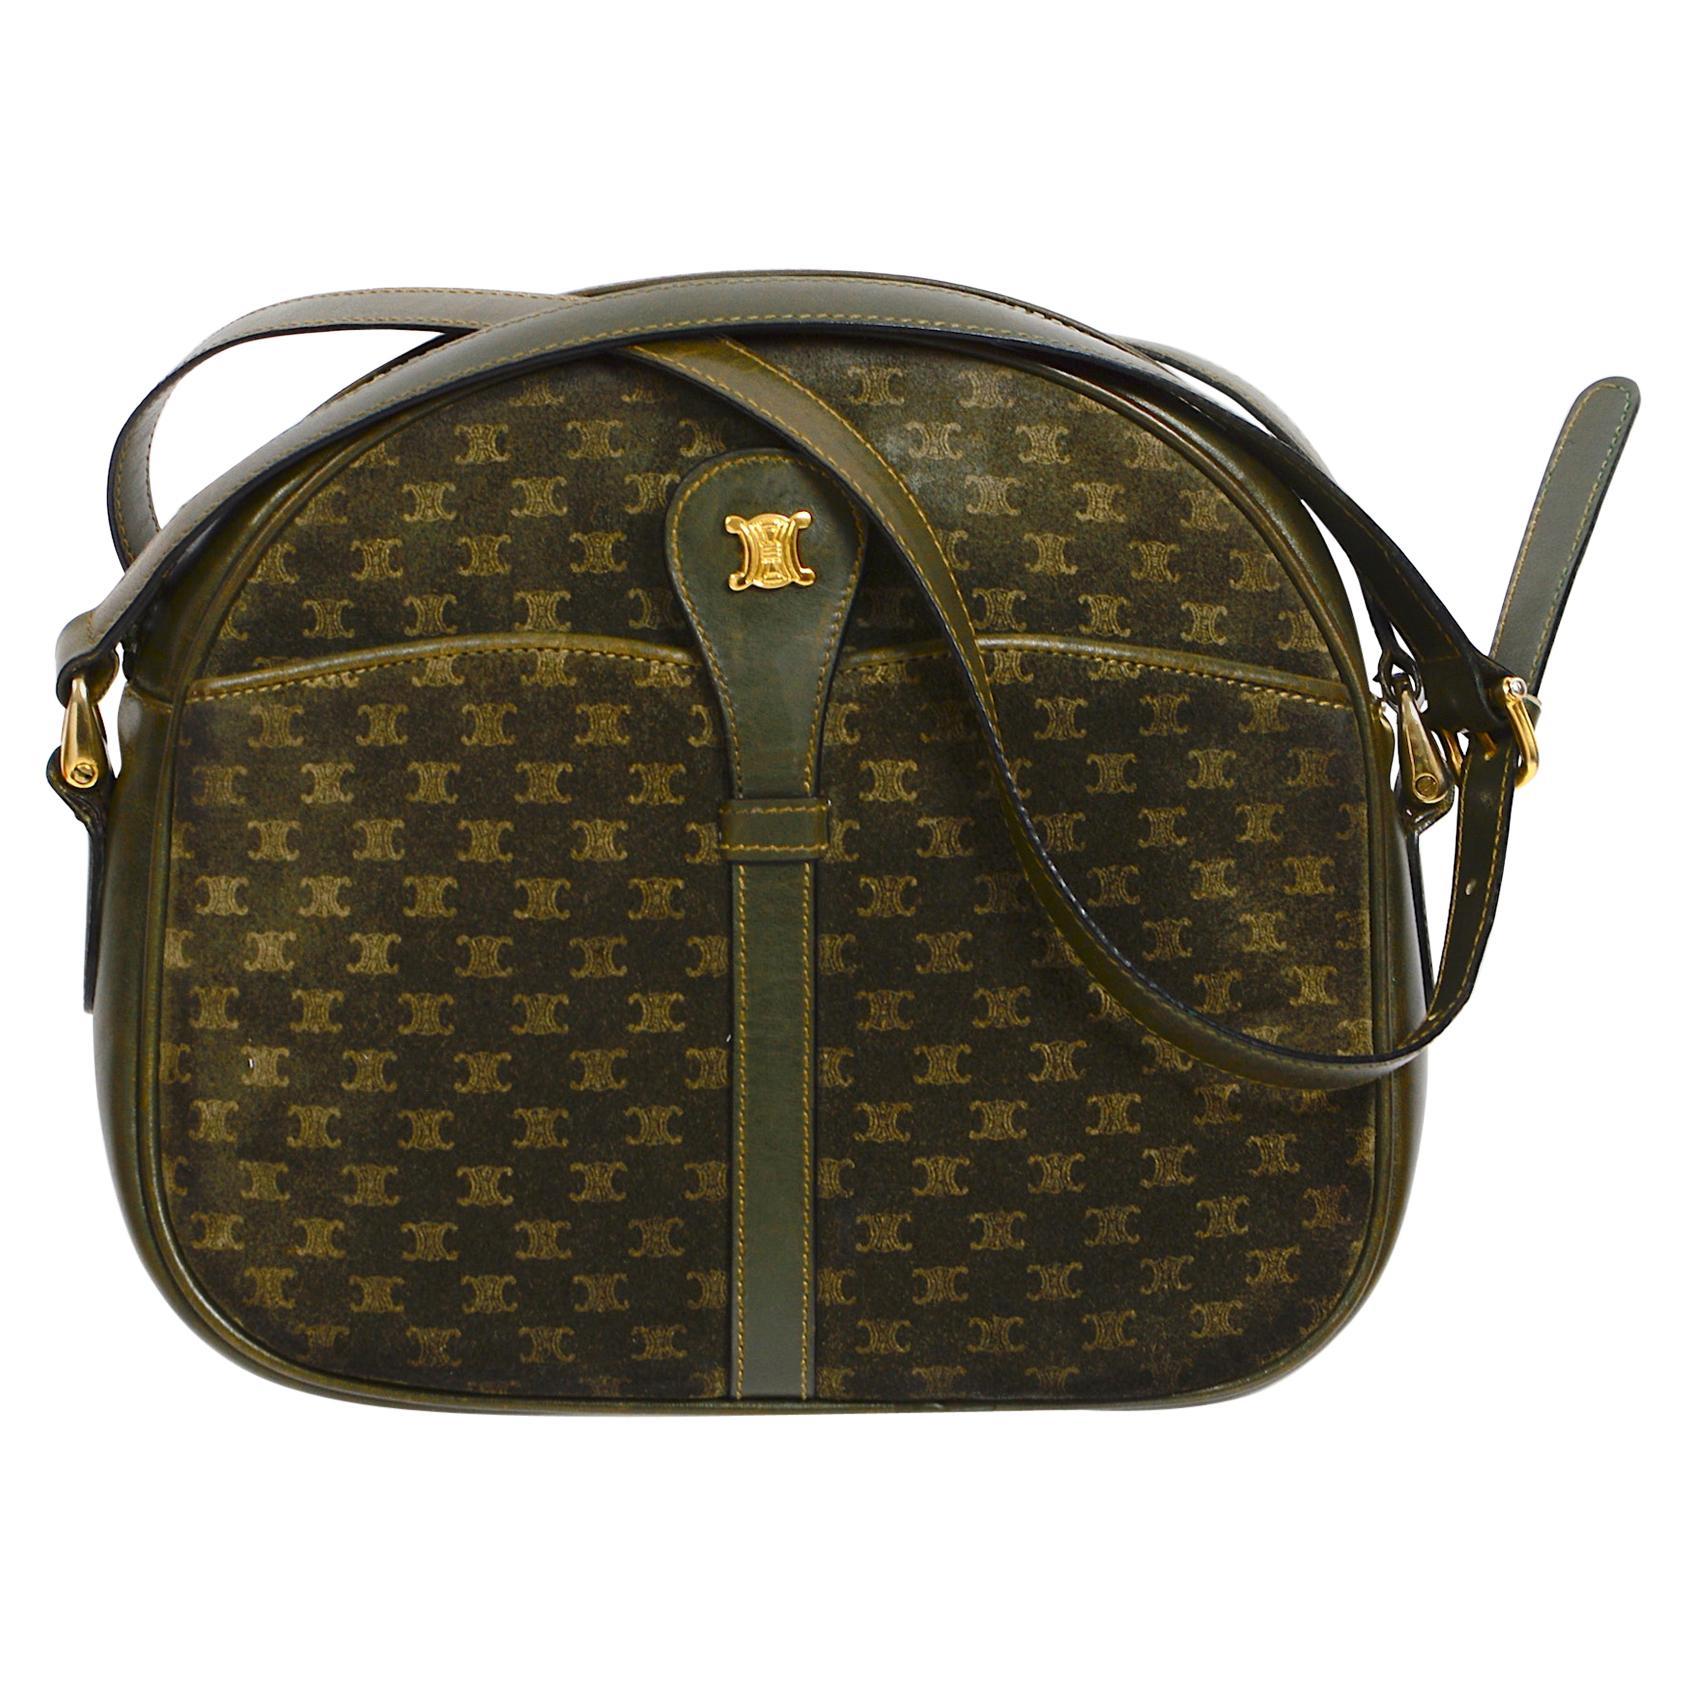 Celine vintage hunter green logo crossbody bag